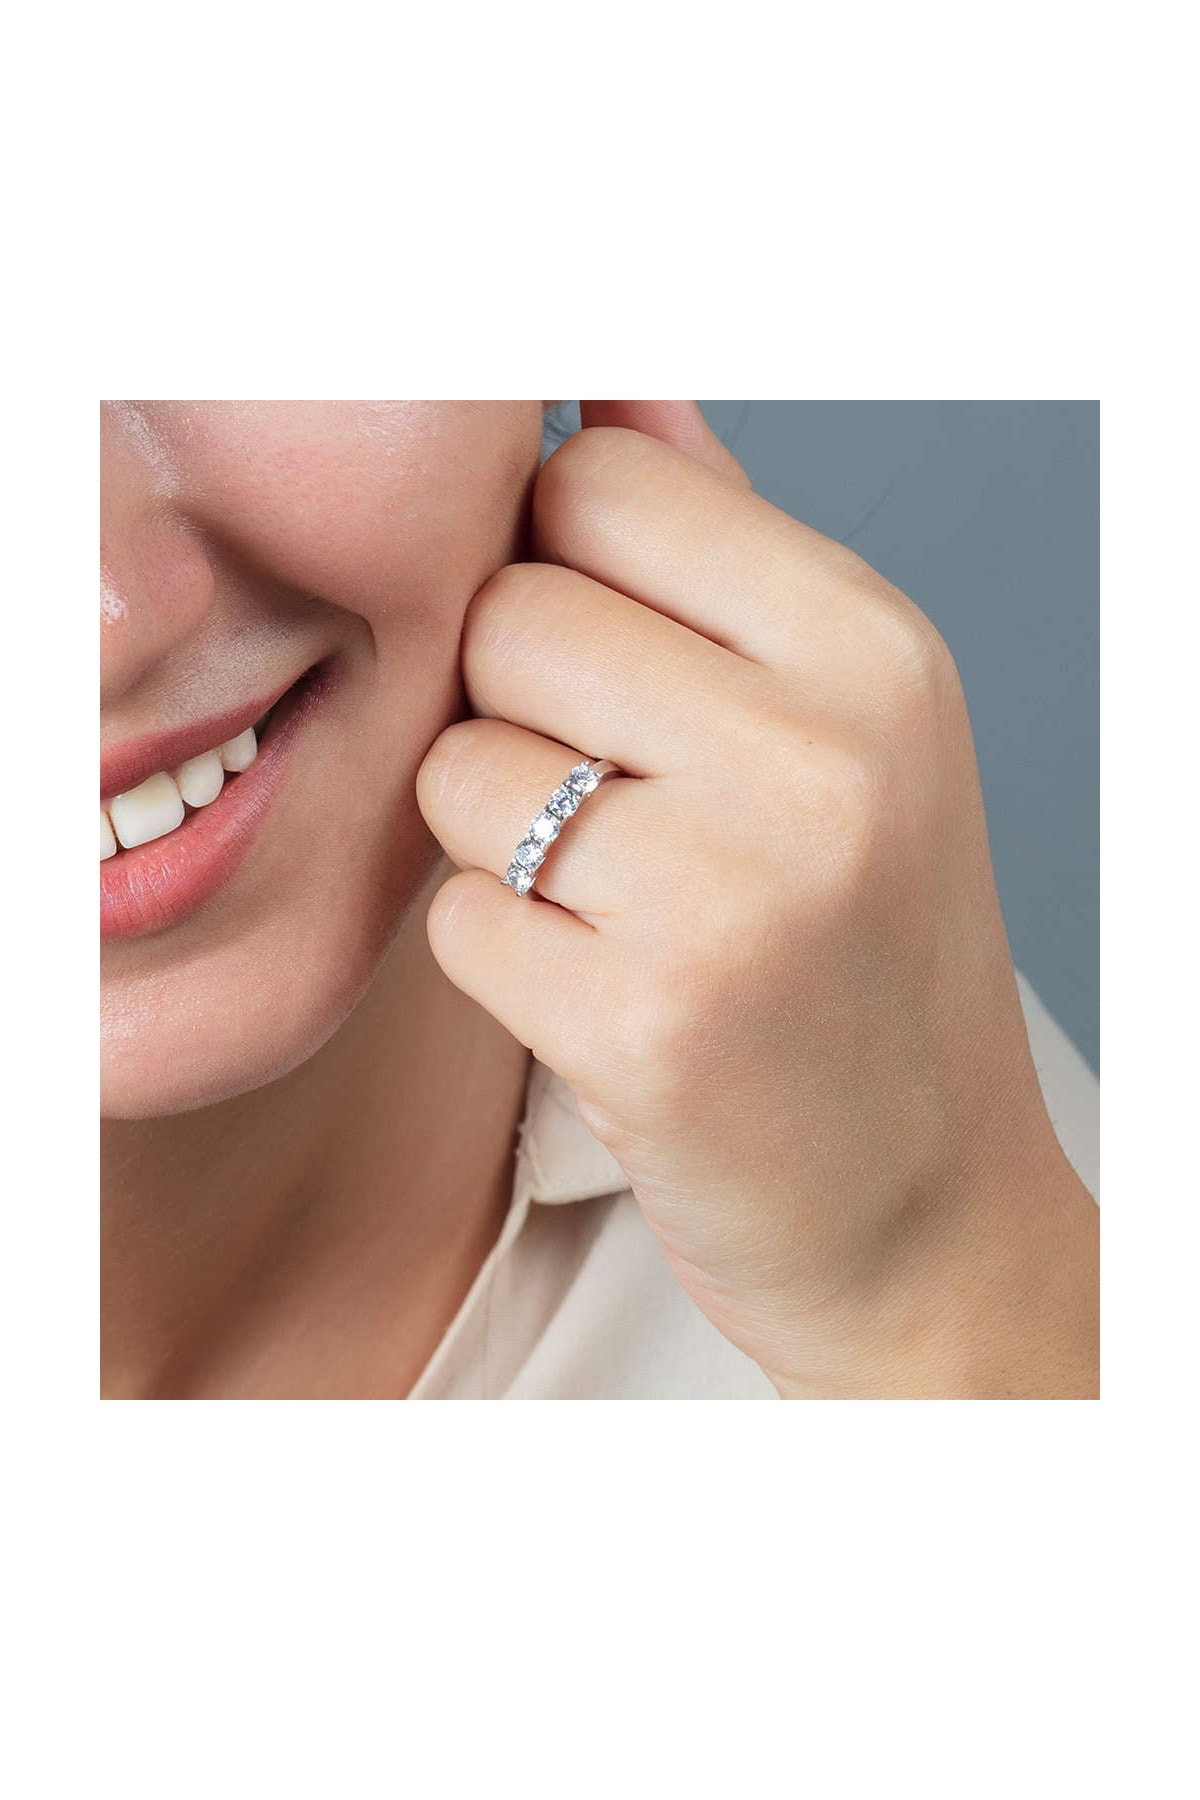 Tesbihane Starlight Diamond Pırlanta Montür Mini Tasarım 925 Ayar Gümüş Bayan Beştaş Yüzük 102001809 2